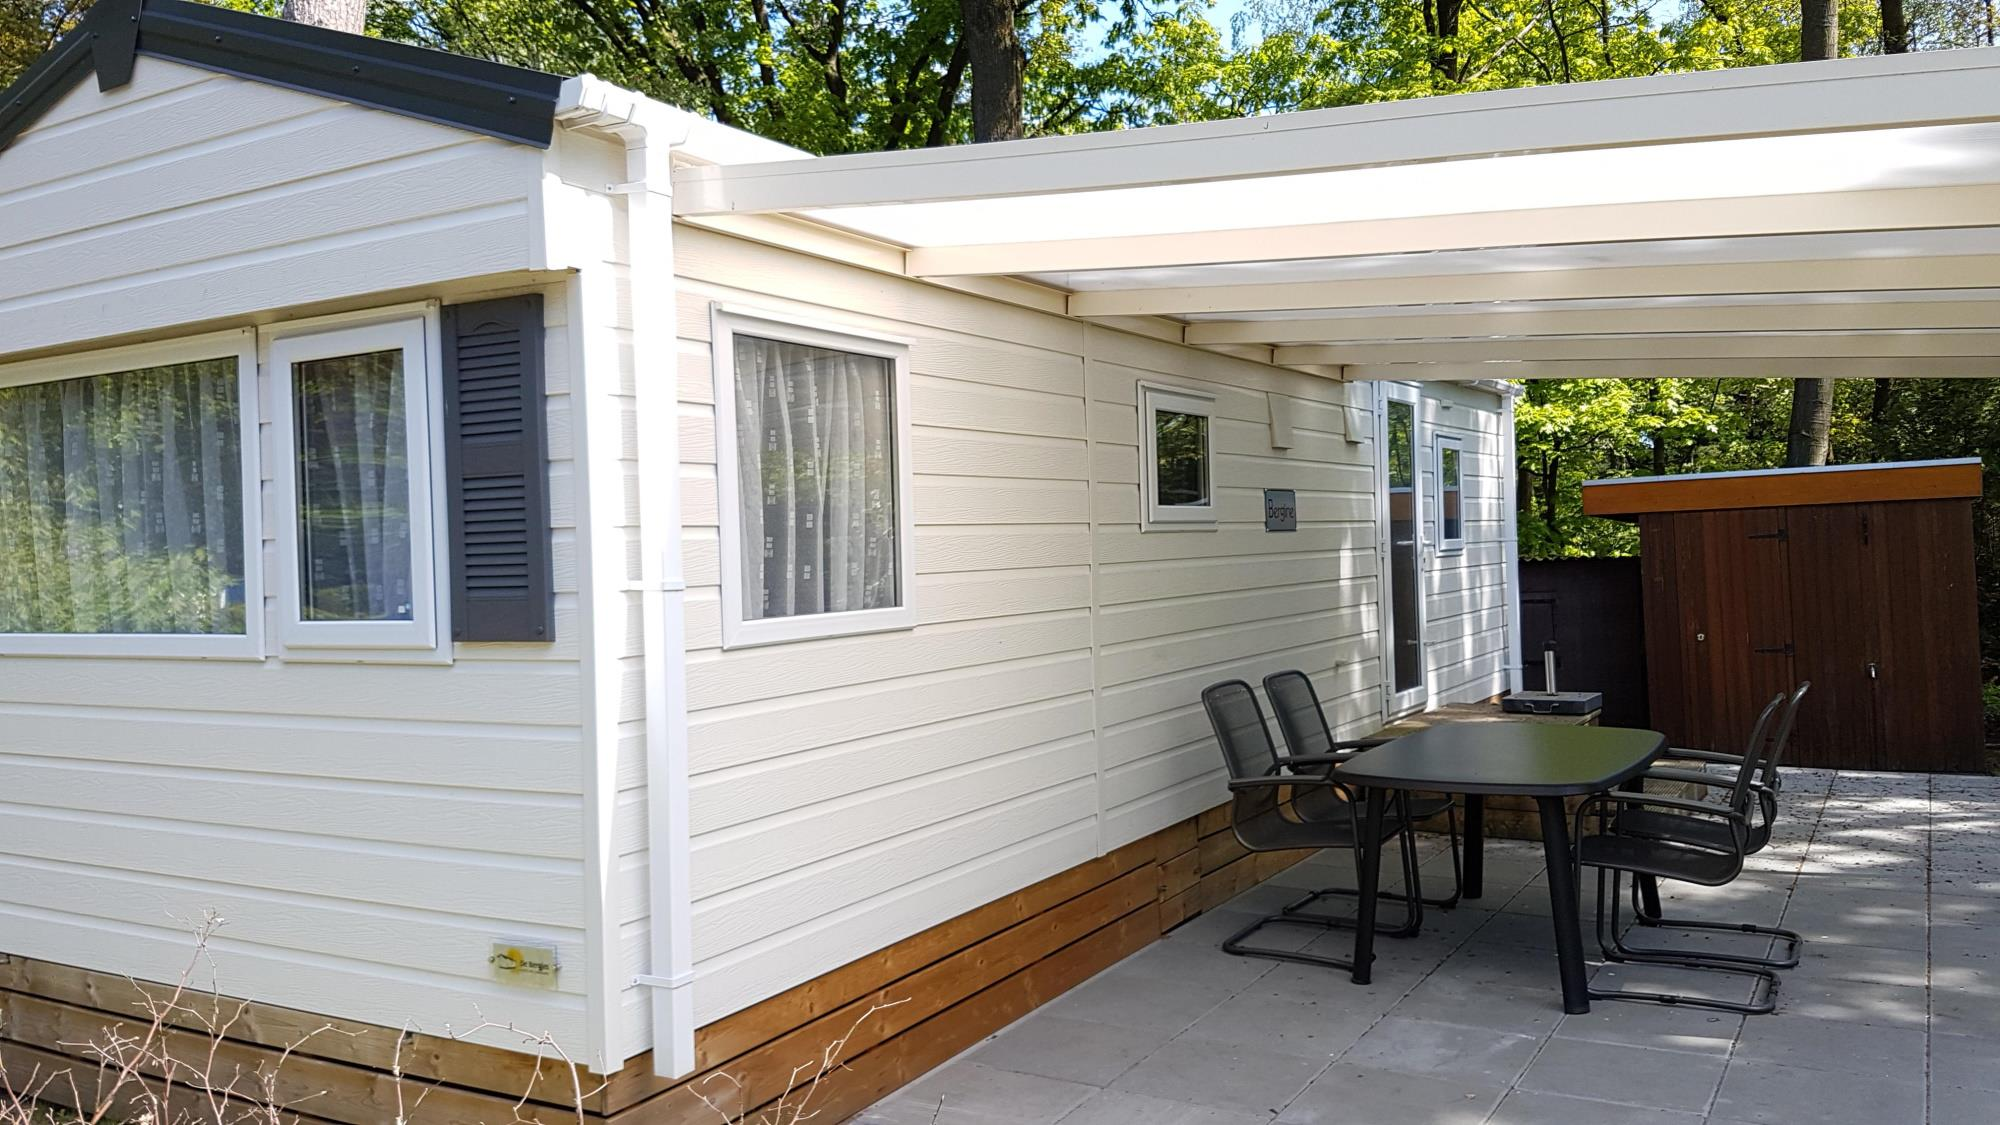 Location - Mobil Home - 2 Chambres - Ardoer Comfortcamping De Bosgraaf